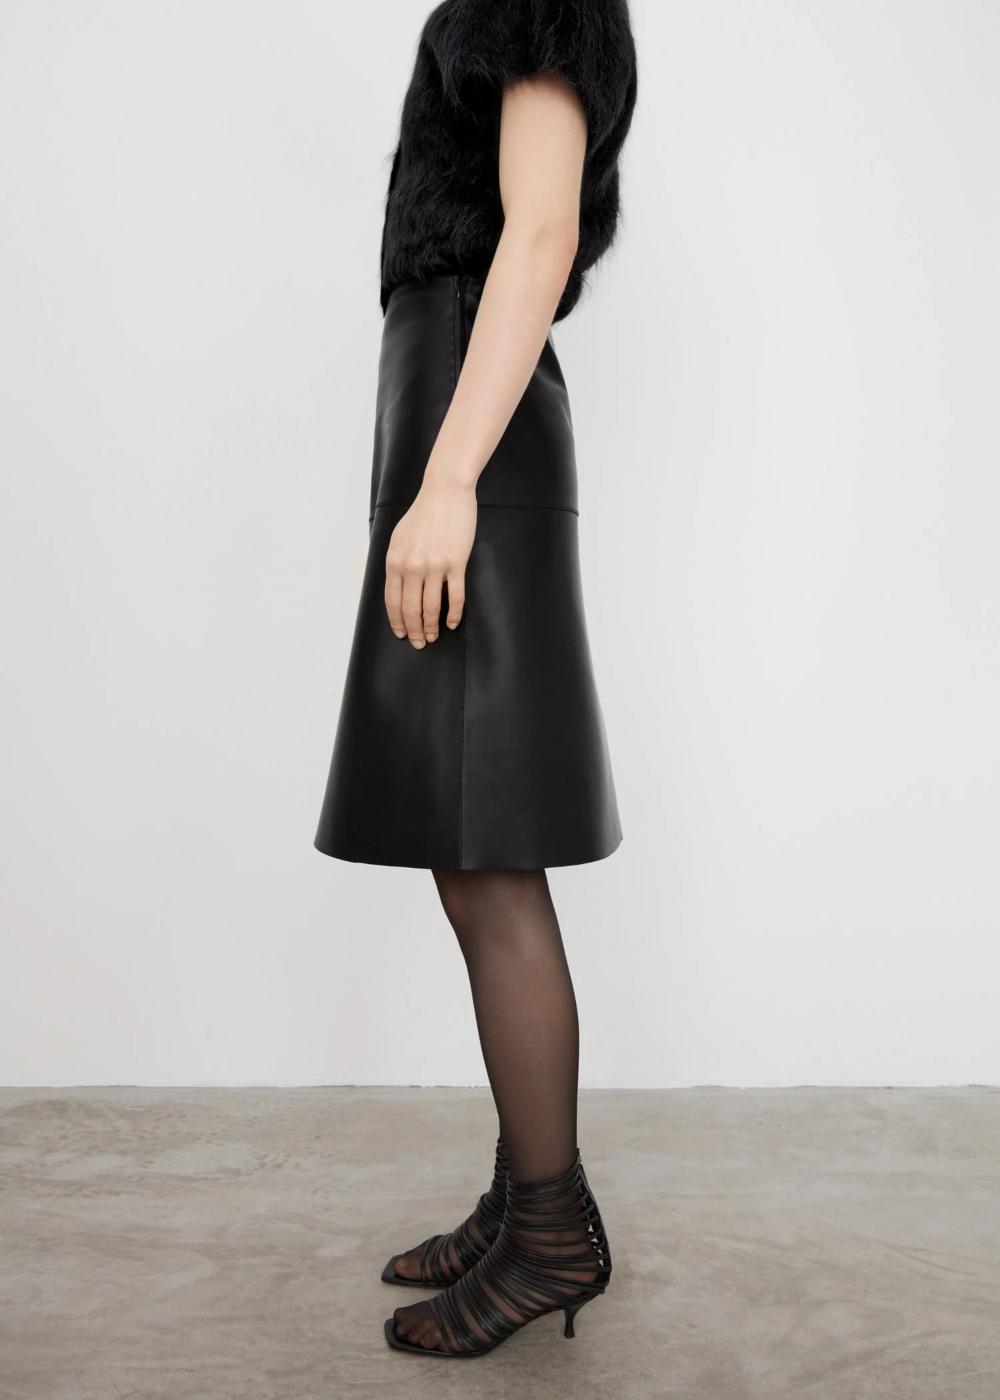 Dresses Skirts Black Leather Skirts Leather Skirt Skirts [ 1400 x 1000 Pixel ]